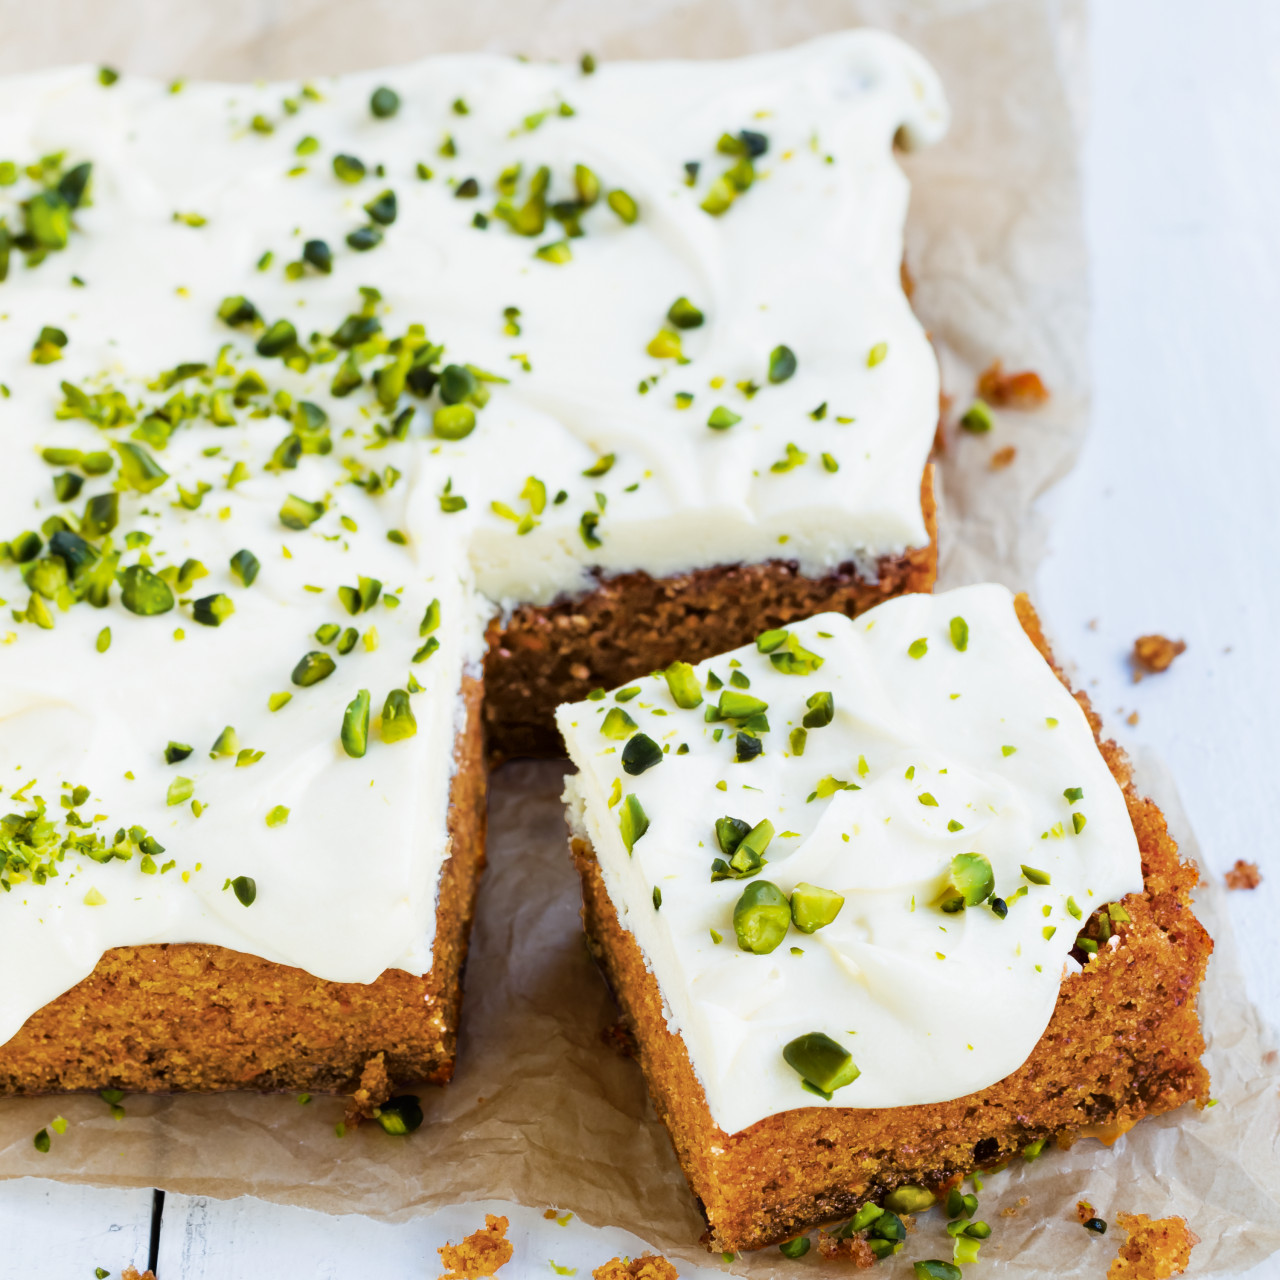 8 Great Vegan Baking Recipes